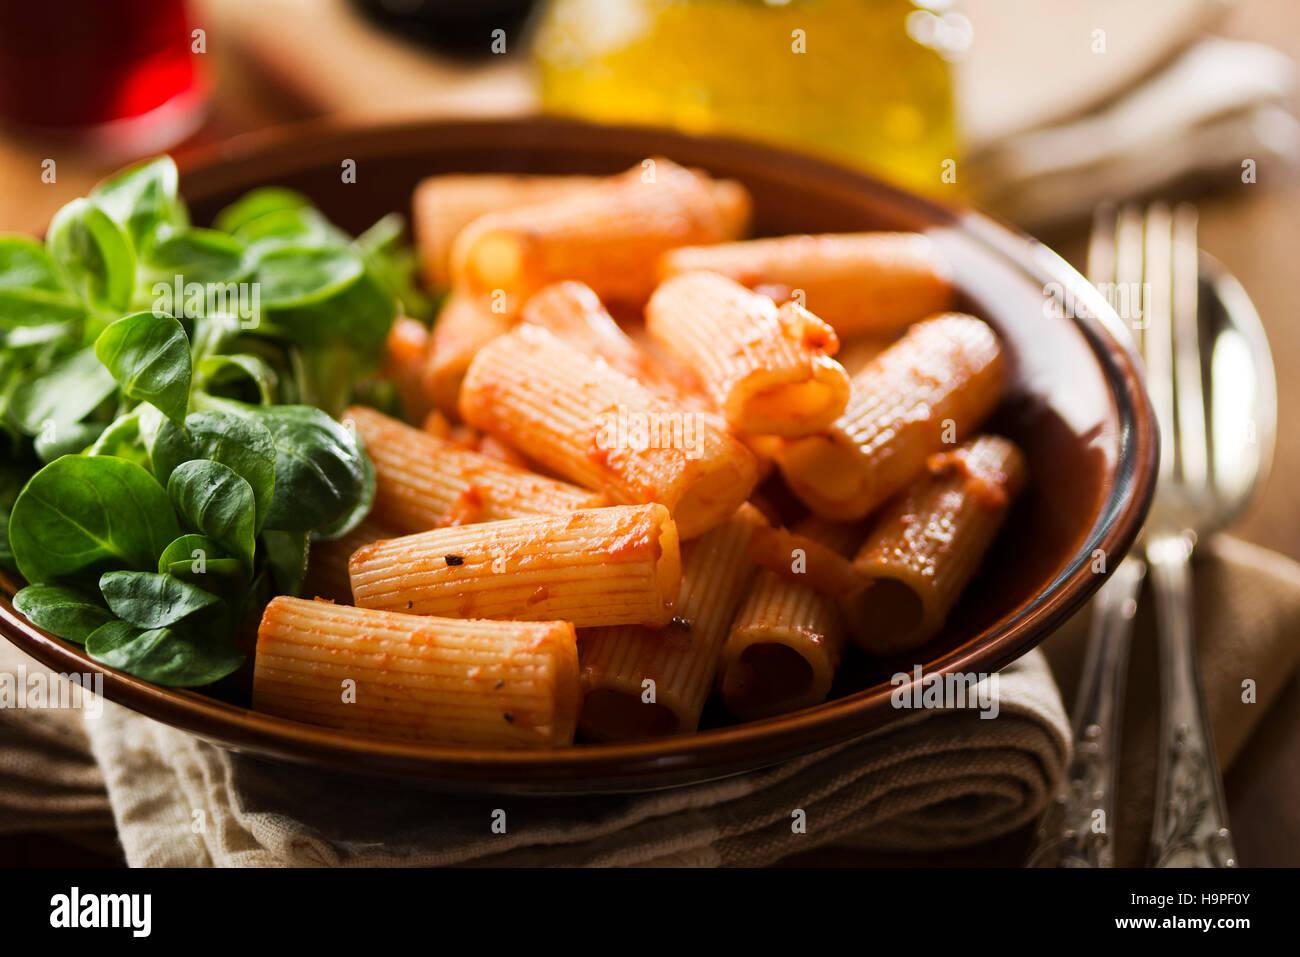 Macaroni pasta with tomato sauce close up - Stock Image